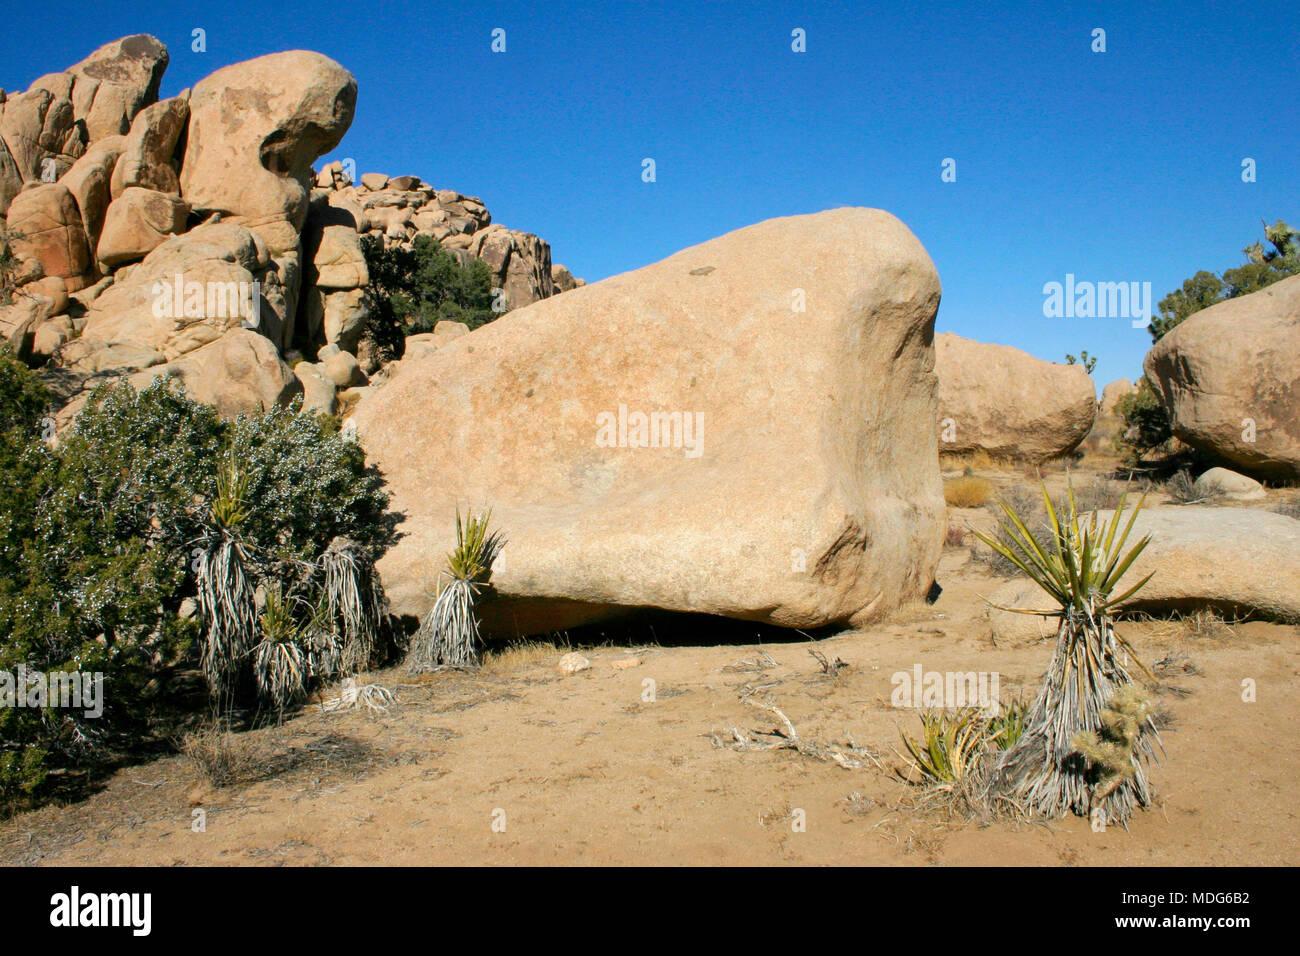 Boulders and Joshua Trees in Joshua Tree National Park, California. Stock Photo